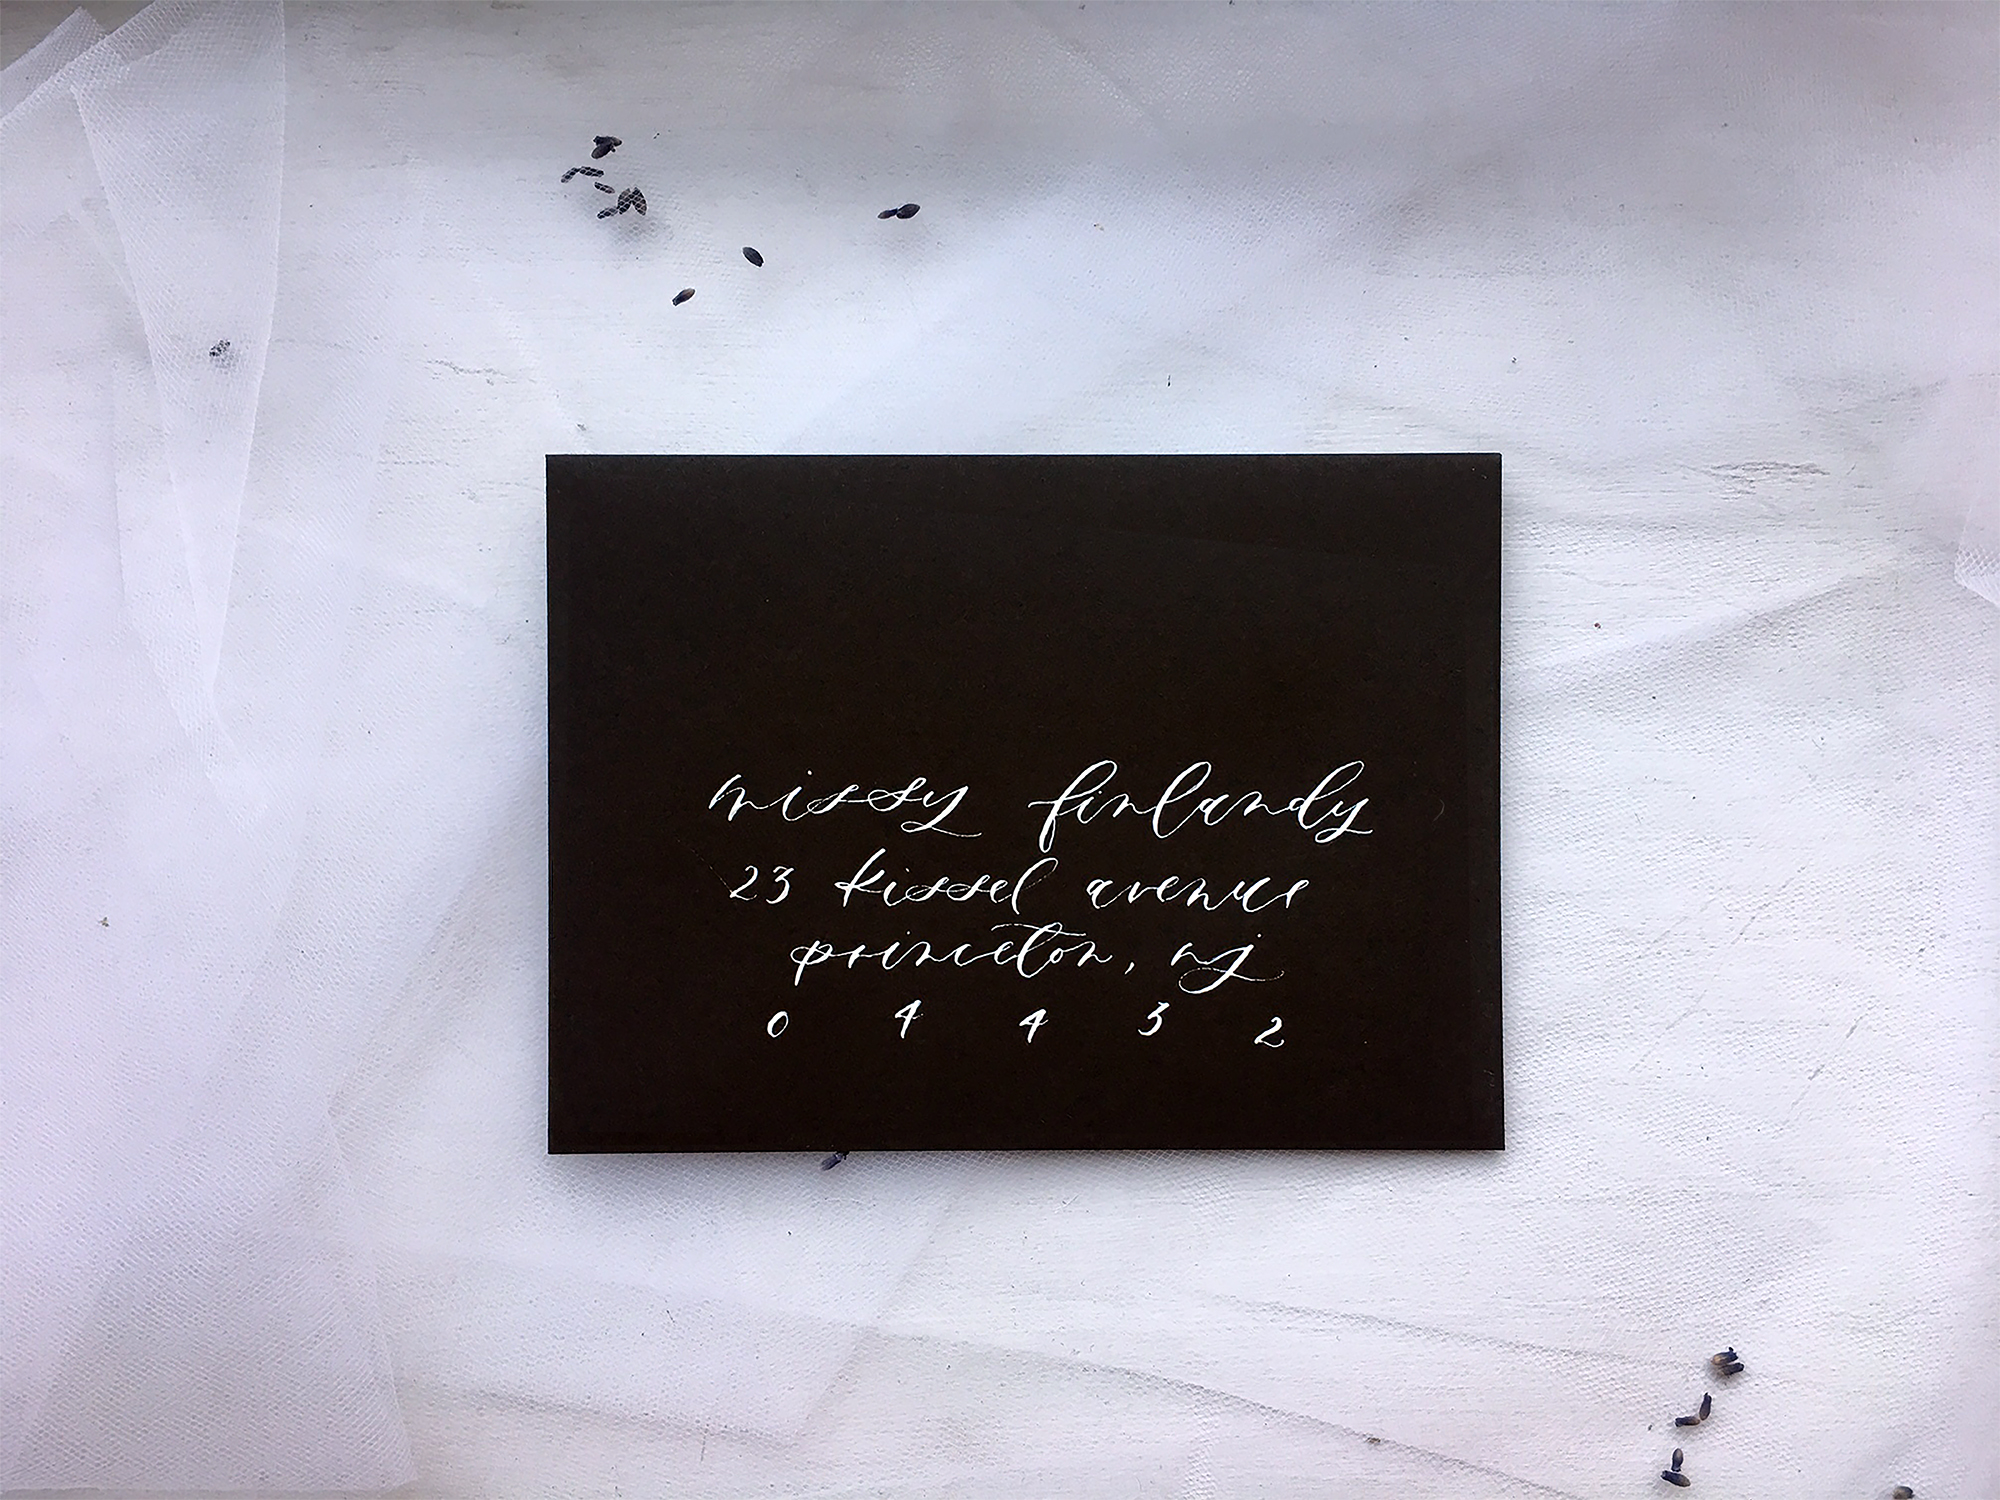 CalligraphyStyles_2.jpg